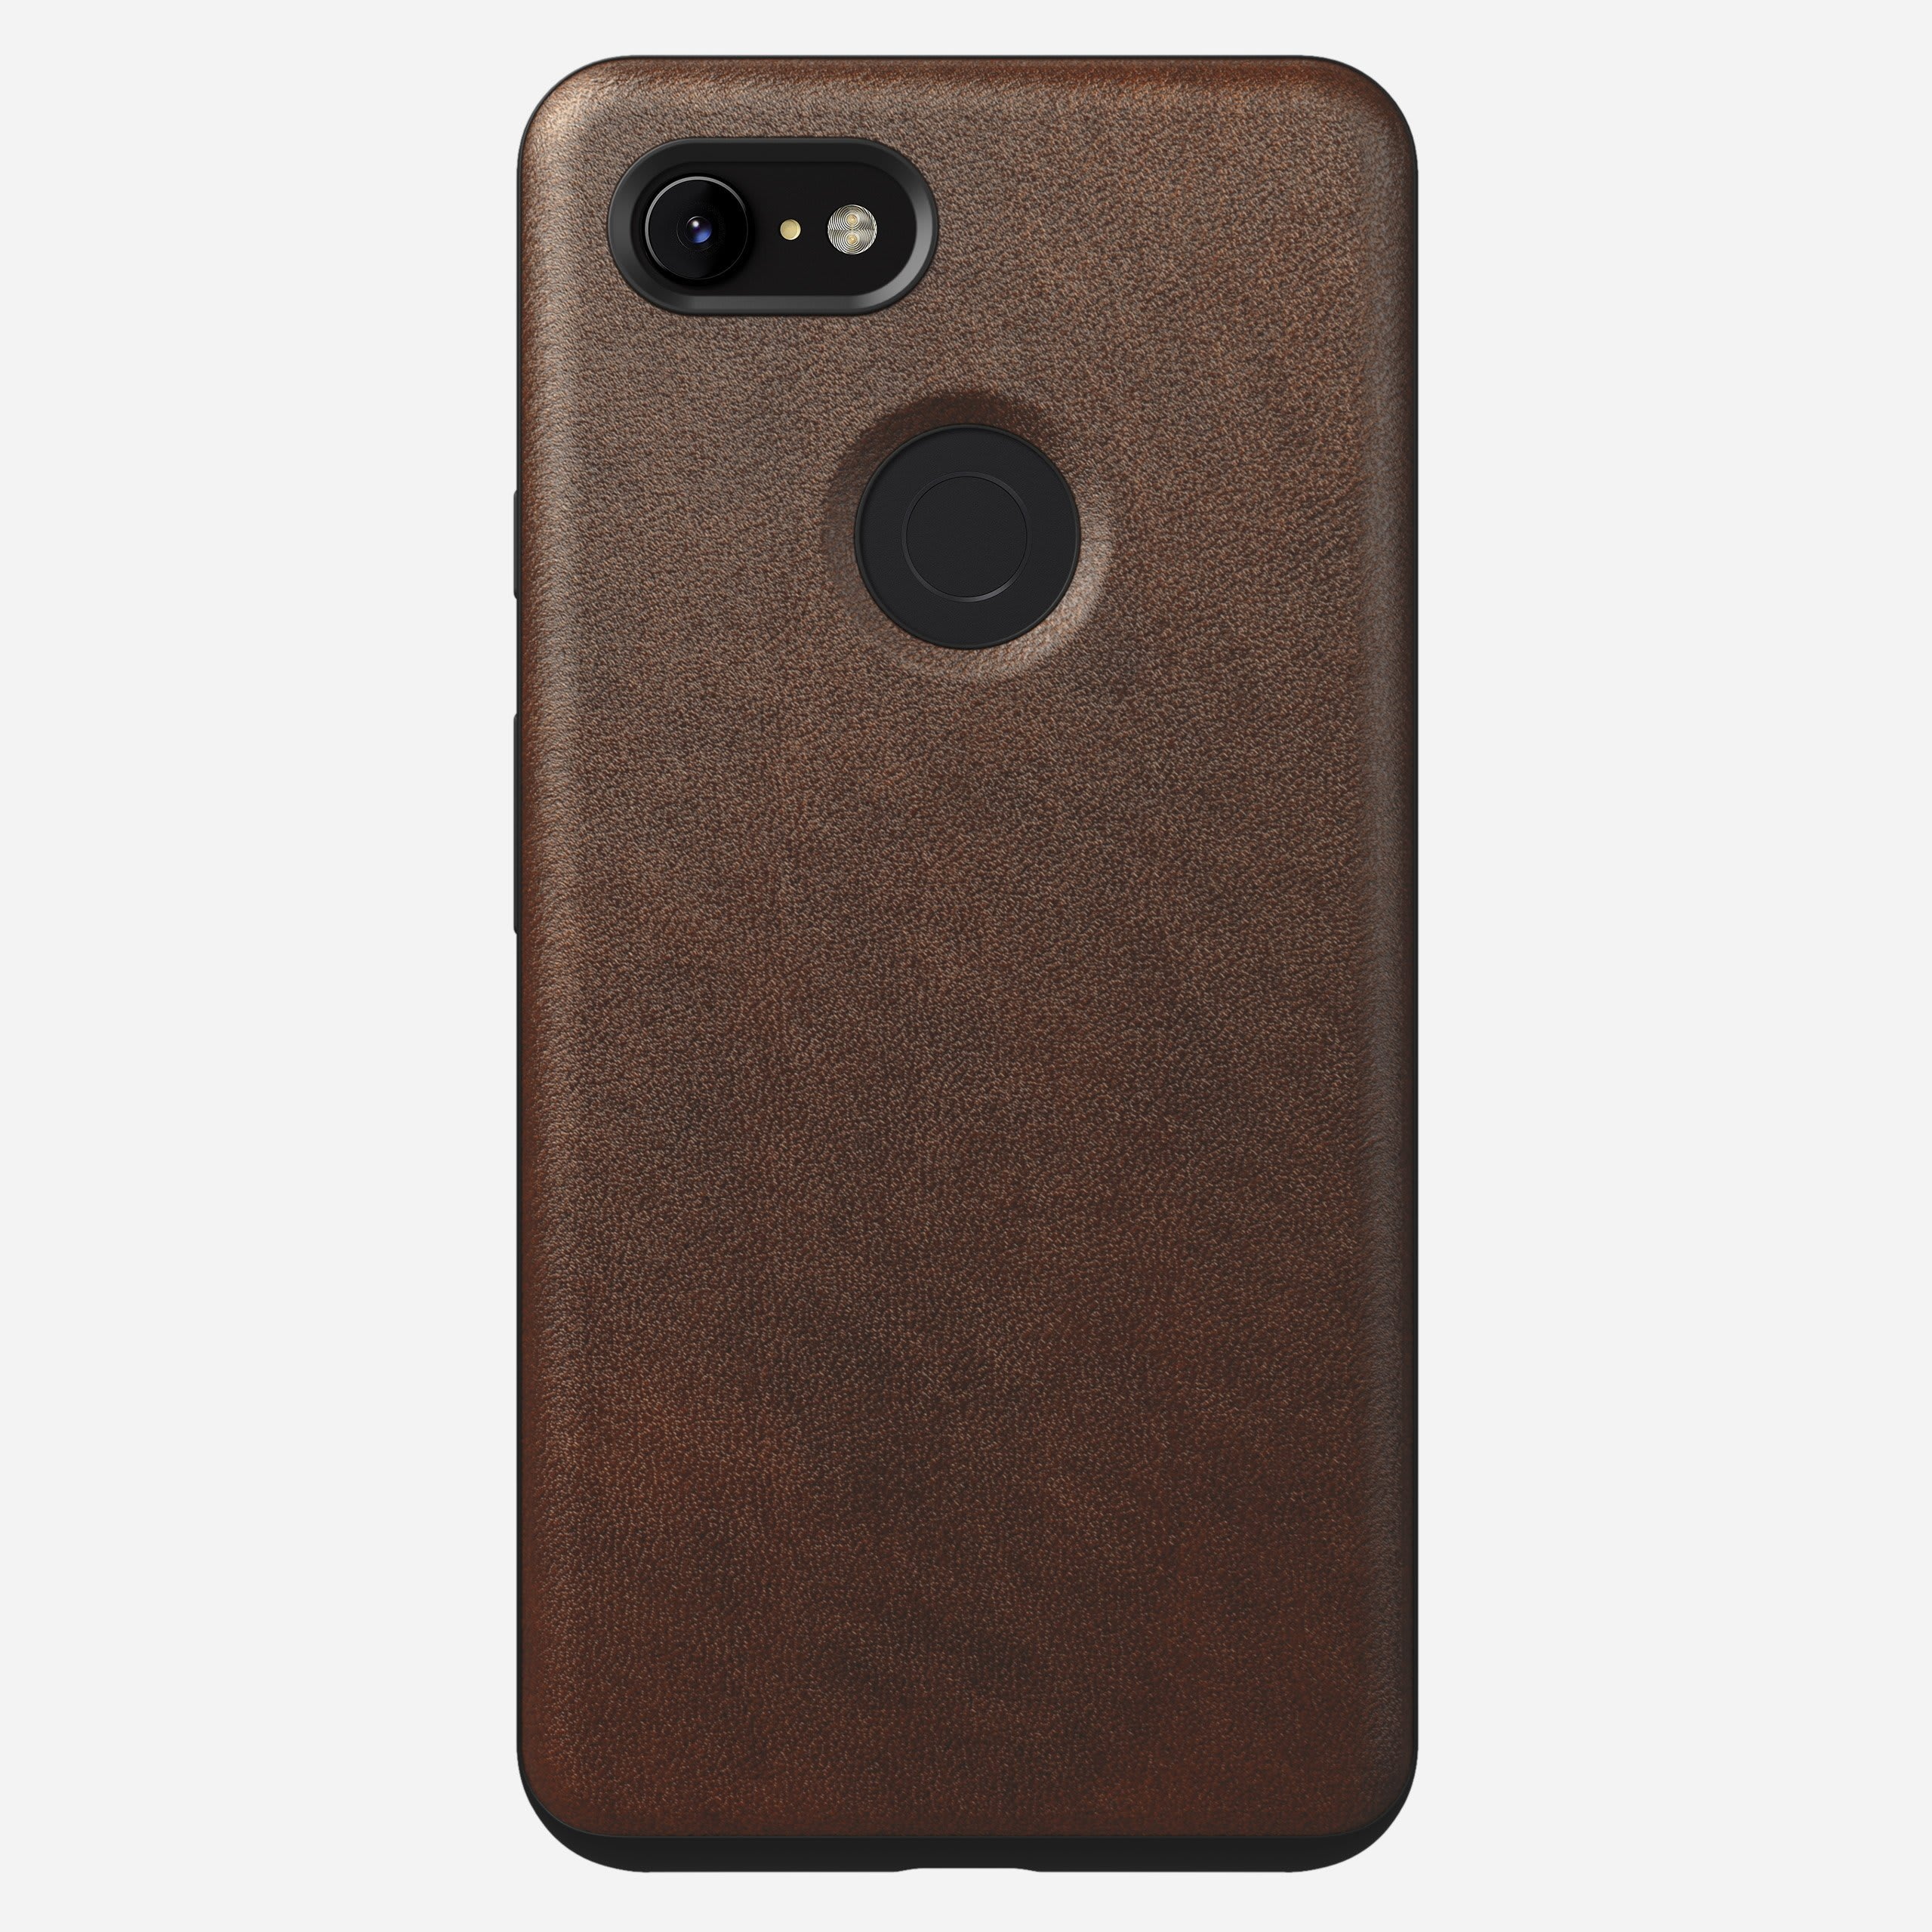 Rugged case rustic brown pixel 3 xl